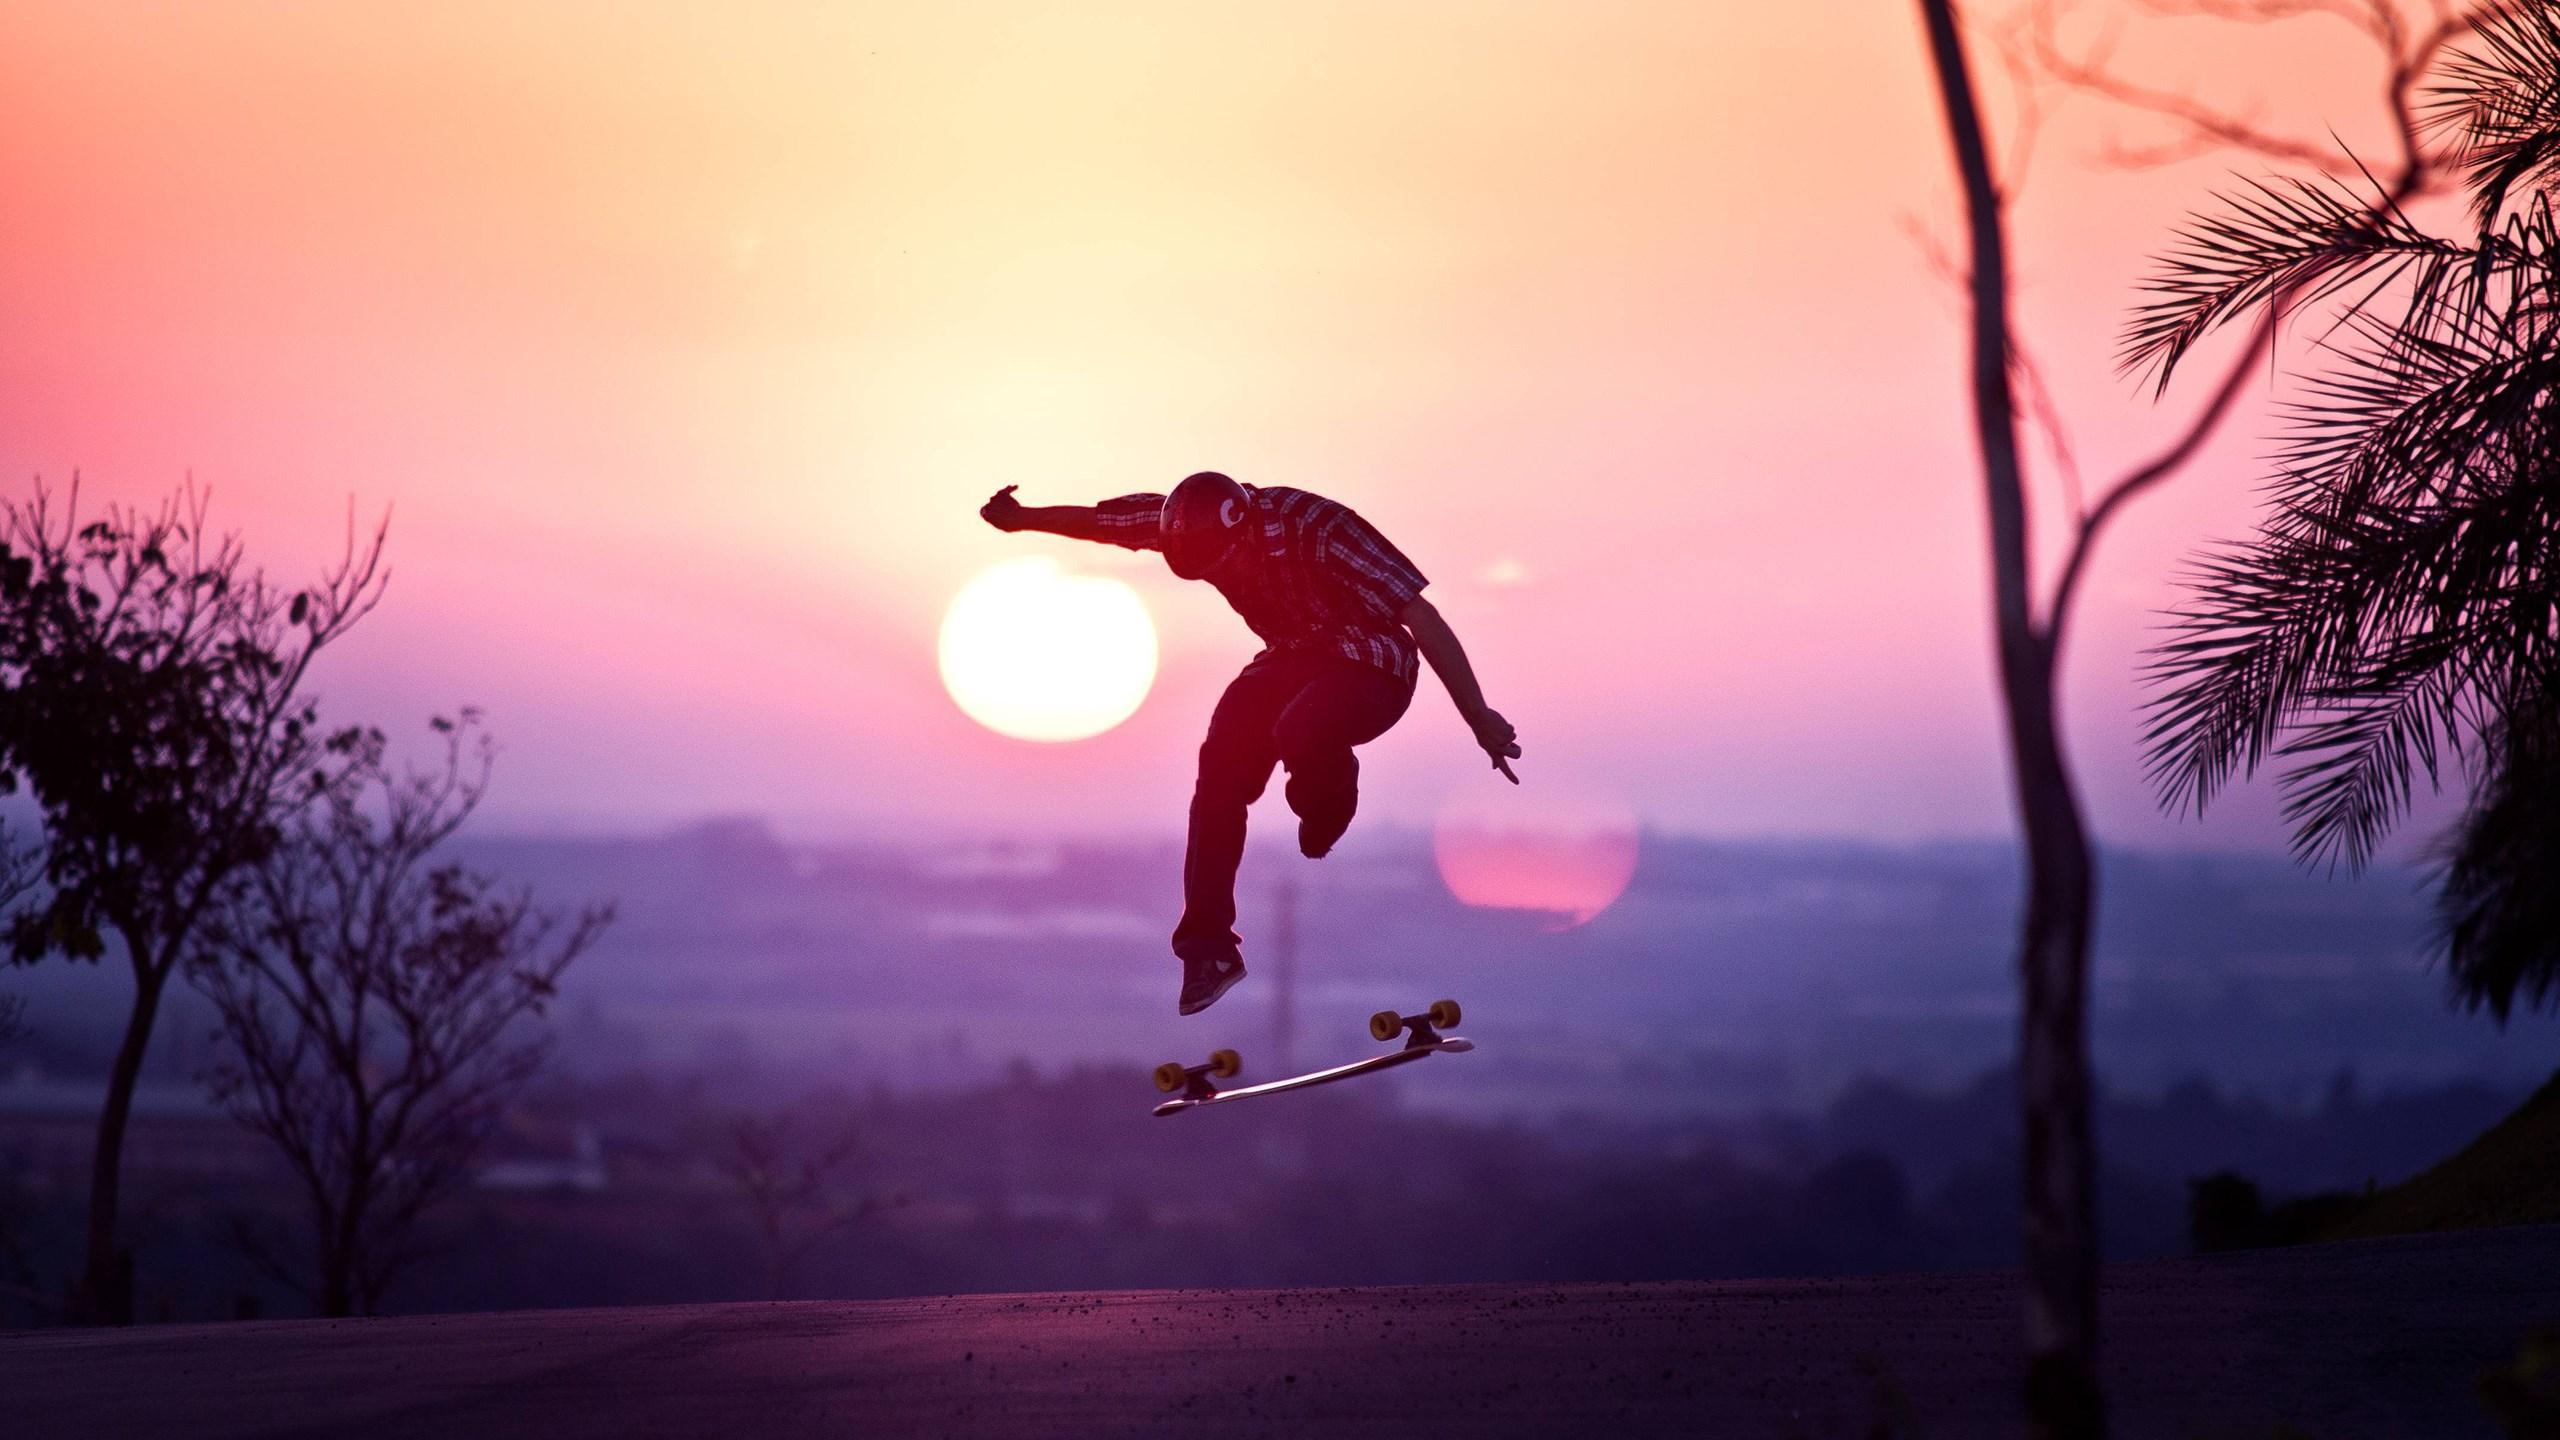 Amazing Skateboard Wallpaper ...